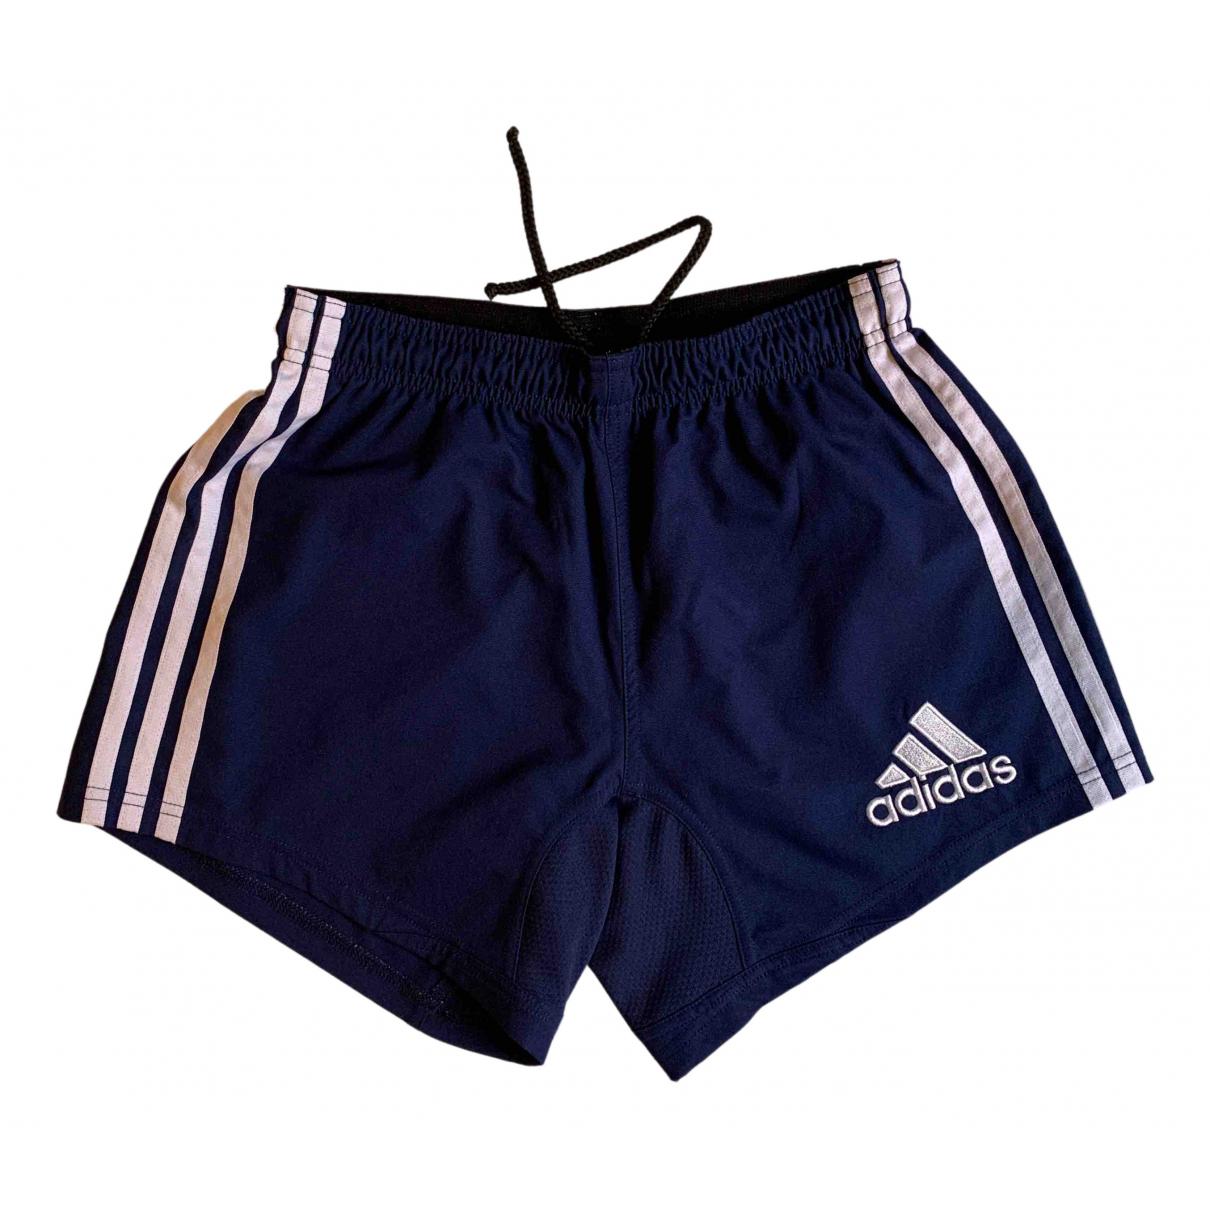 Adidas N Blue Shorts for Women S International